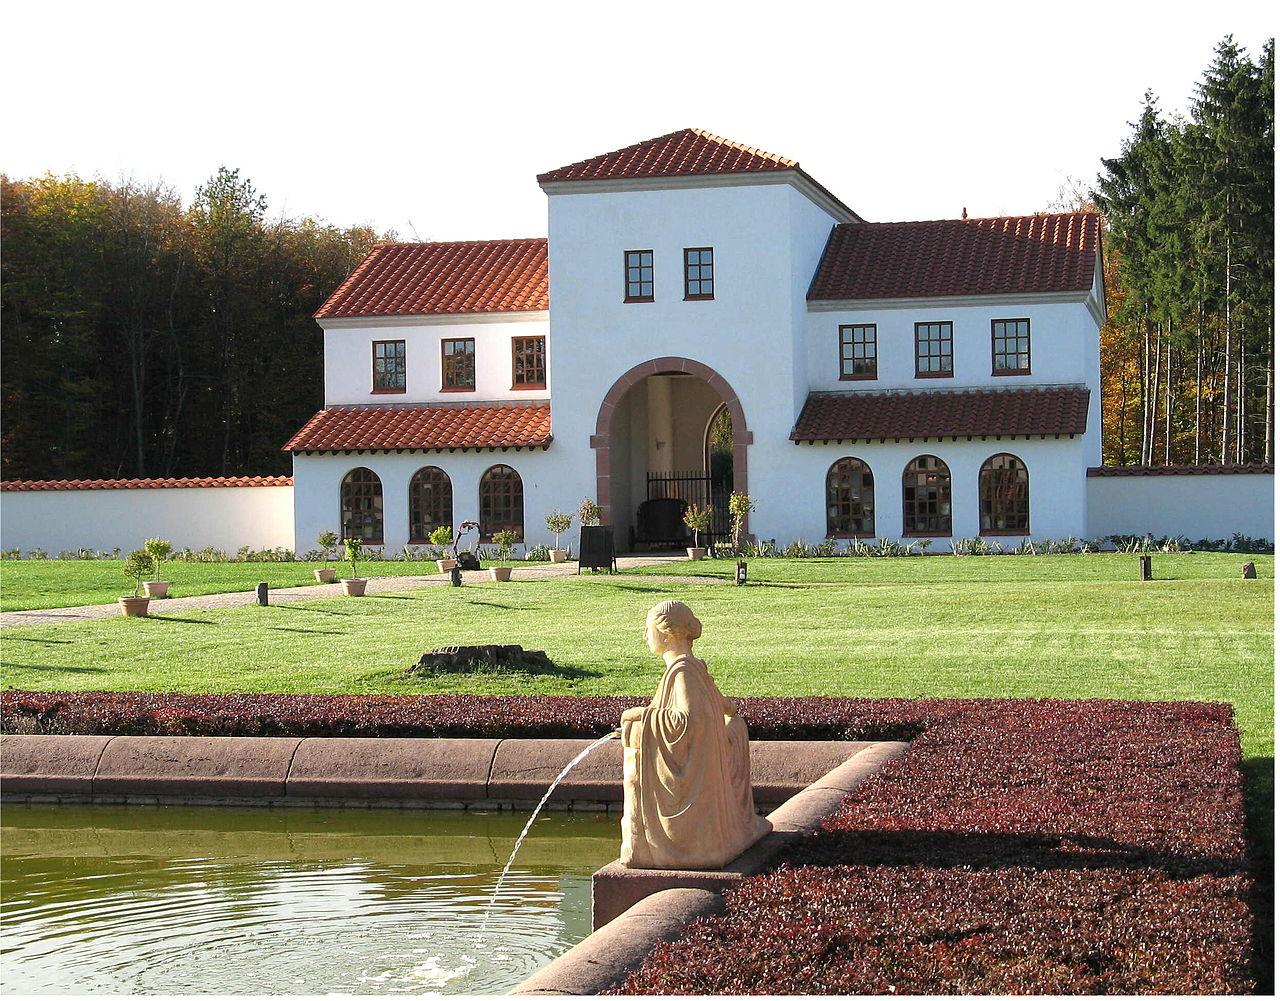 Bild Archäologiepark Römische Villa Borg